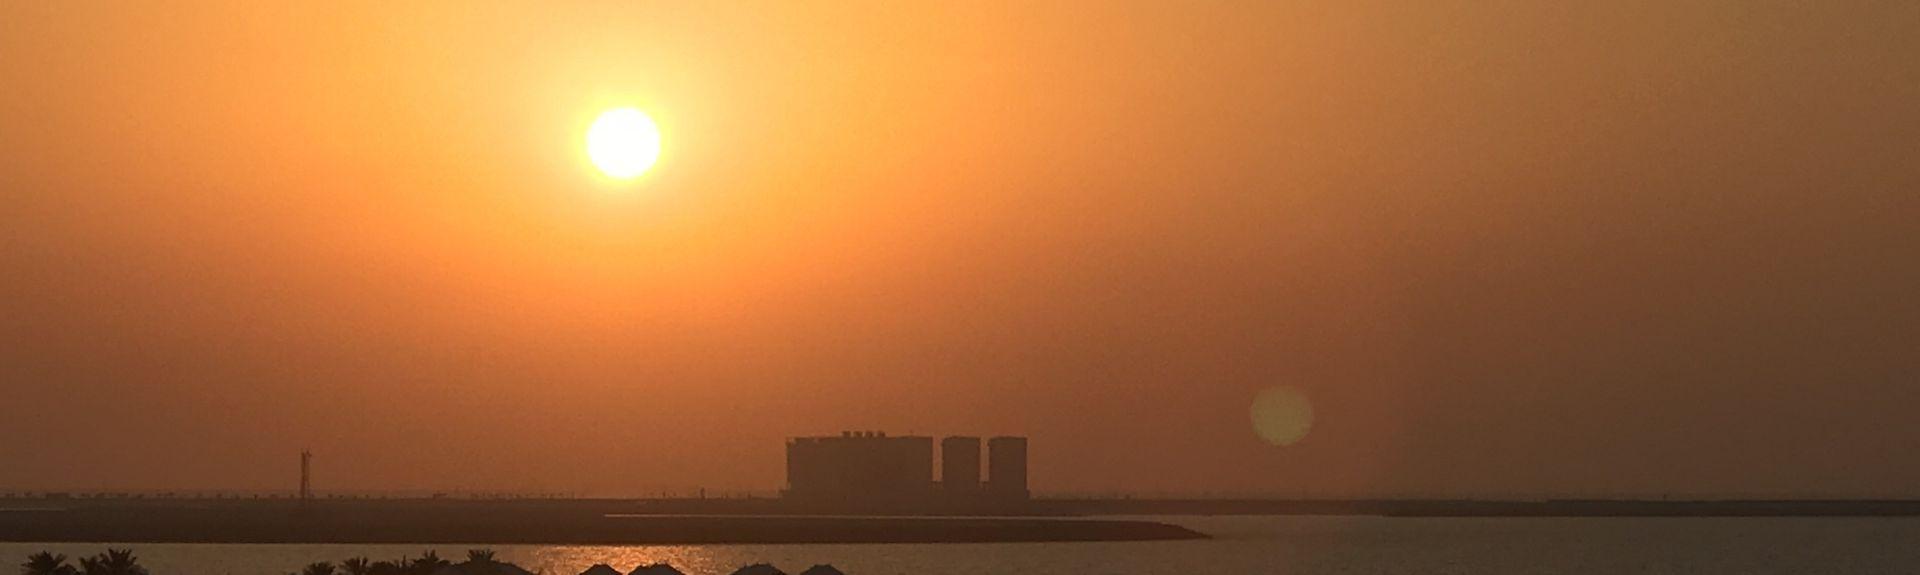 Al Jazirah Al Hamra, Ras al Khaimah, United Arab Emirates